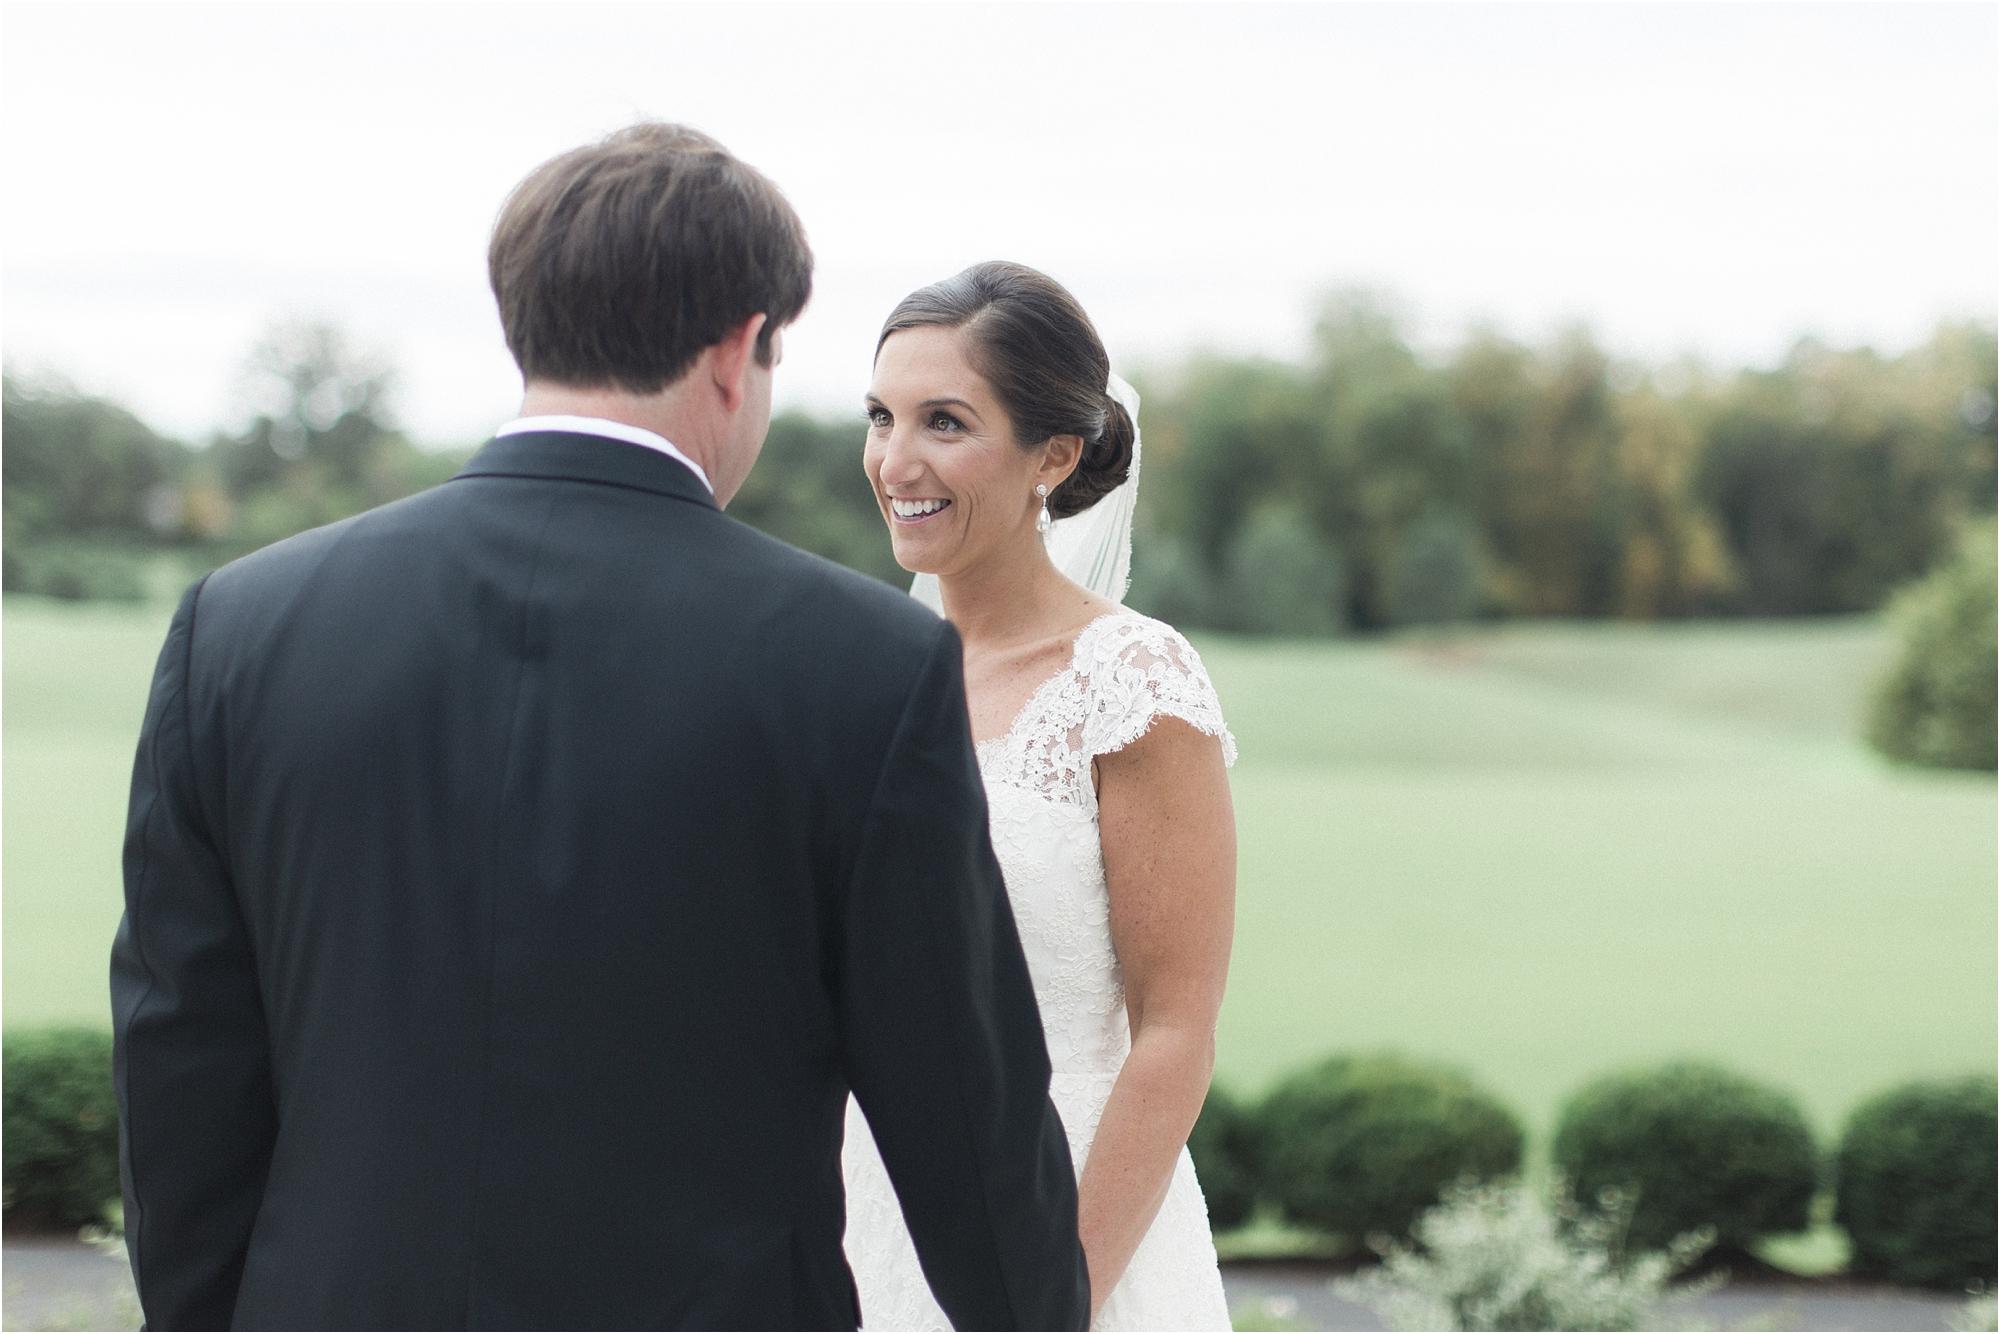 stephanie-yonce-photography-richmond-virginia-country-club-wedding-photo_015.JPG